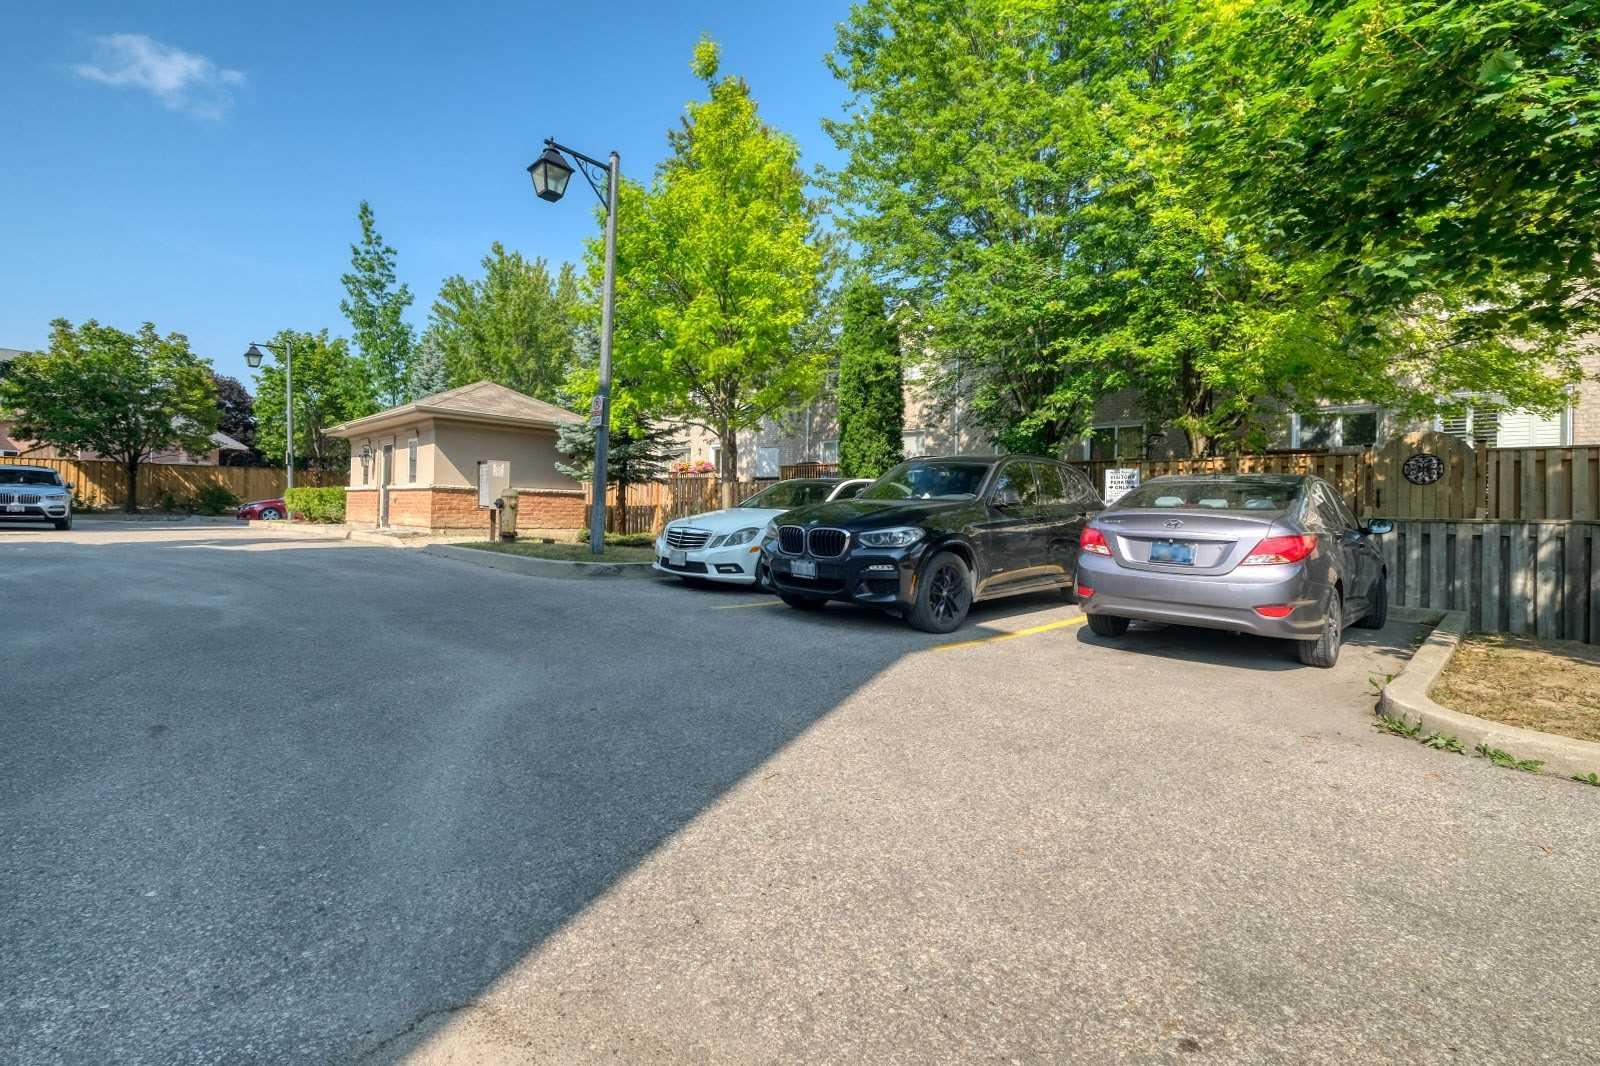 1355 Altona Rd, Pickering, Ontario L1V 1M2, 3 Bedrooms Bedrooms, 7 Rooms Rooms,3 BathroomsBathrooms,Att/Row/Twnhouse,For Sale,Altona,E5354598